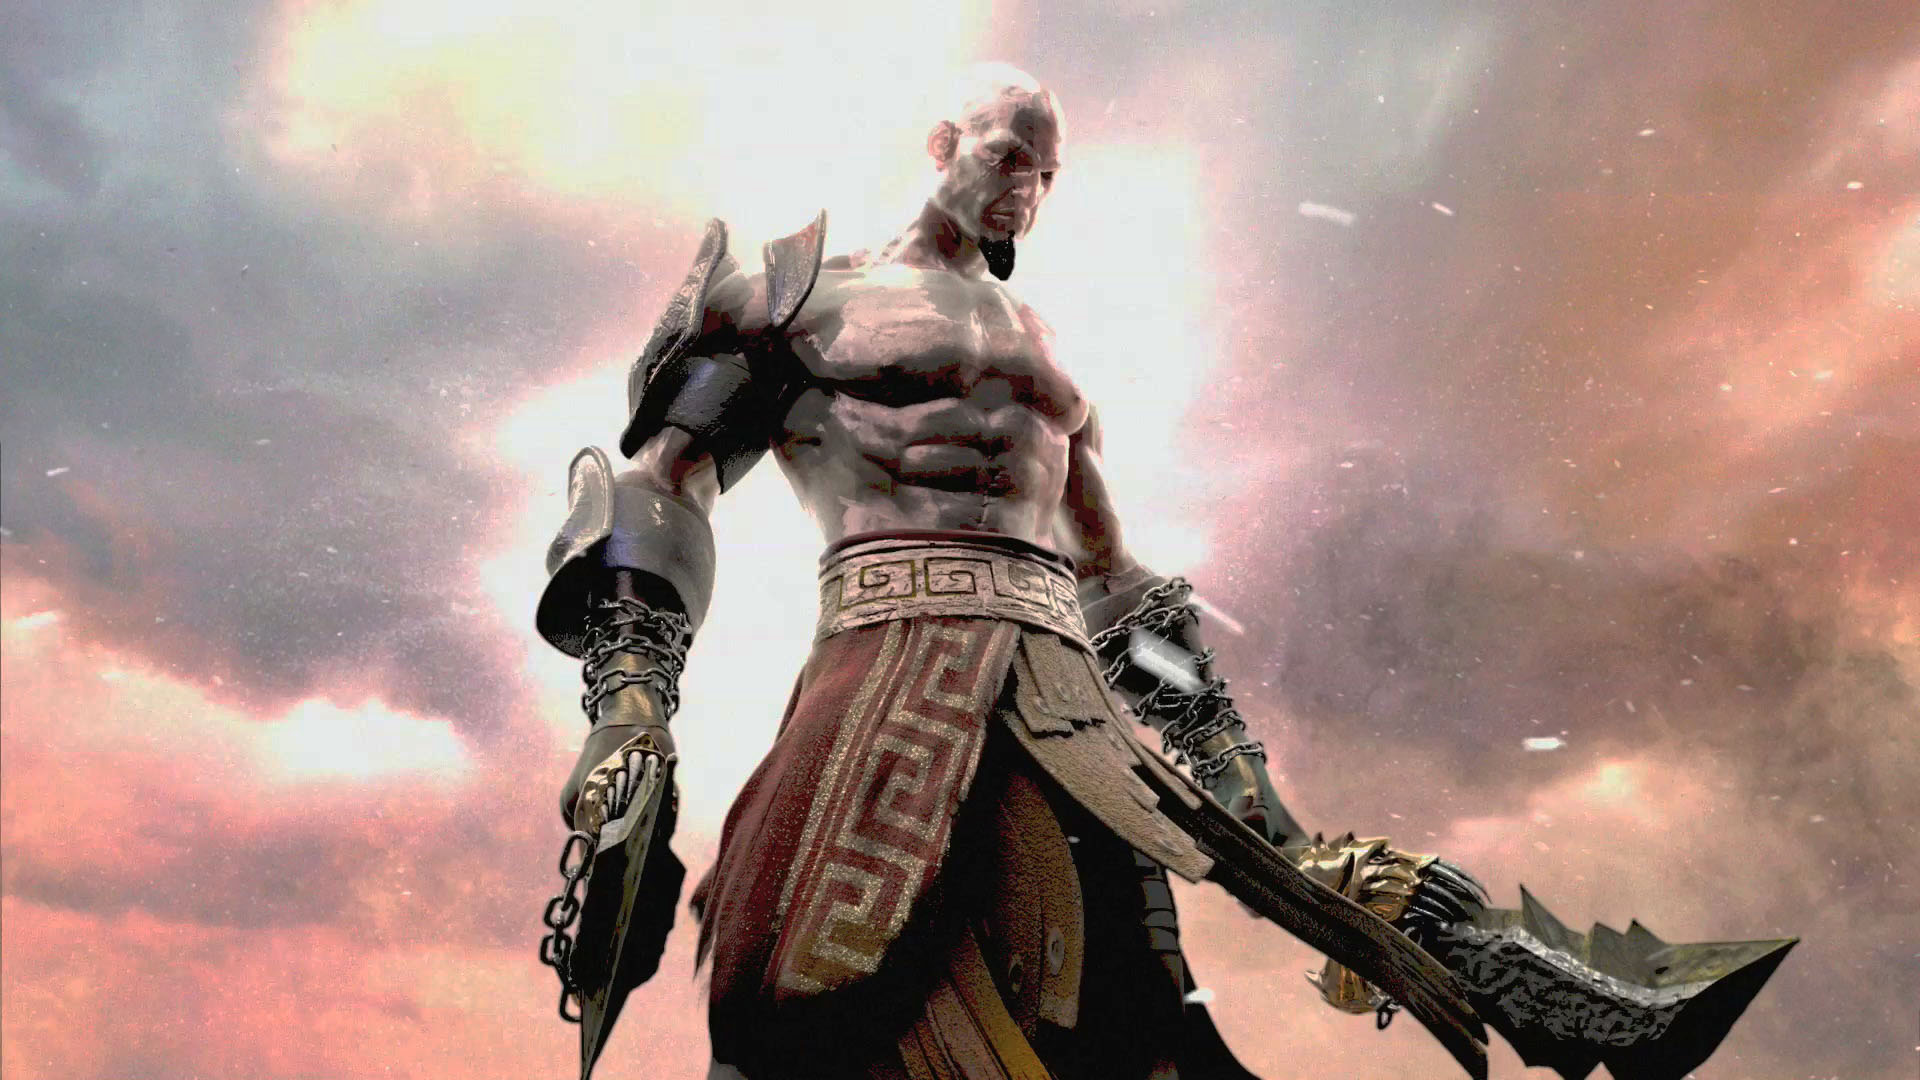 Group of kratos hd wallpaper 3d god of war wallpaper wallpapersafari voltagebd Choice Image